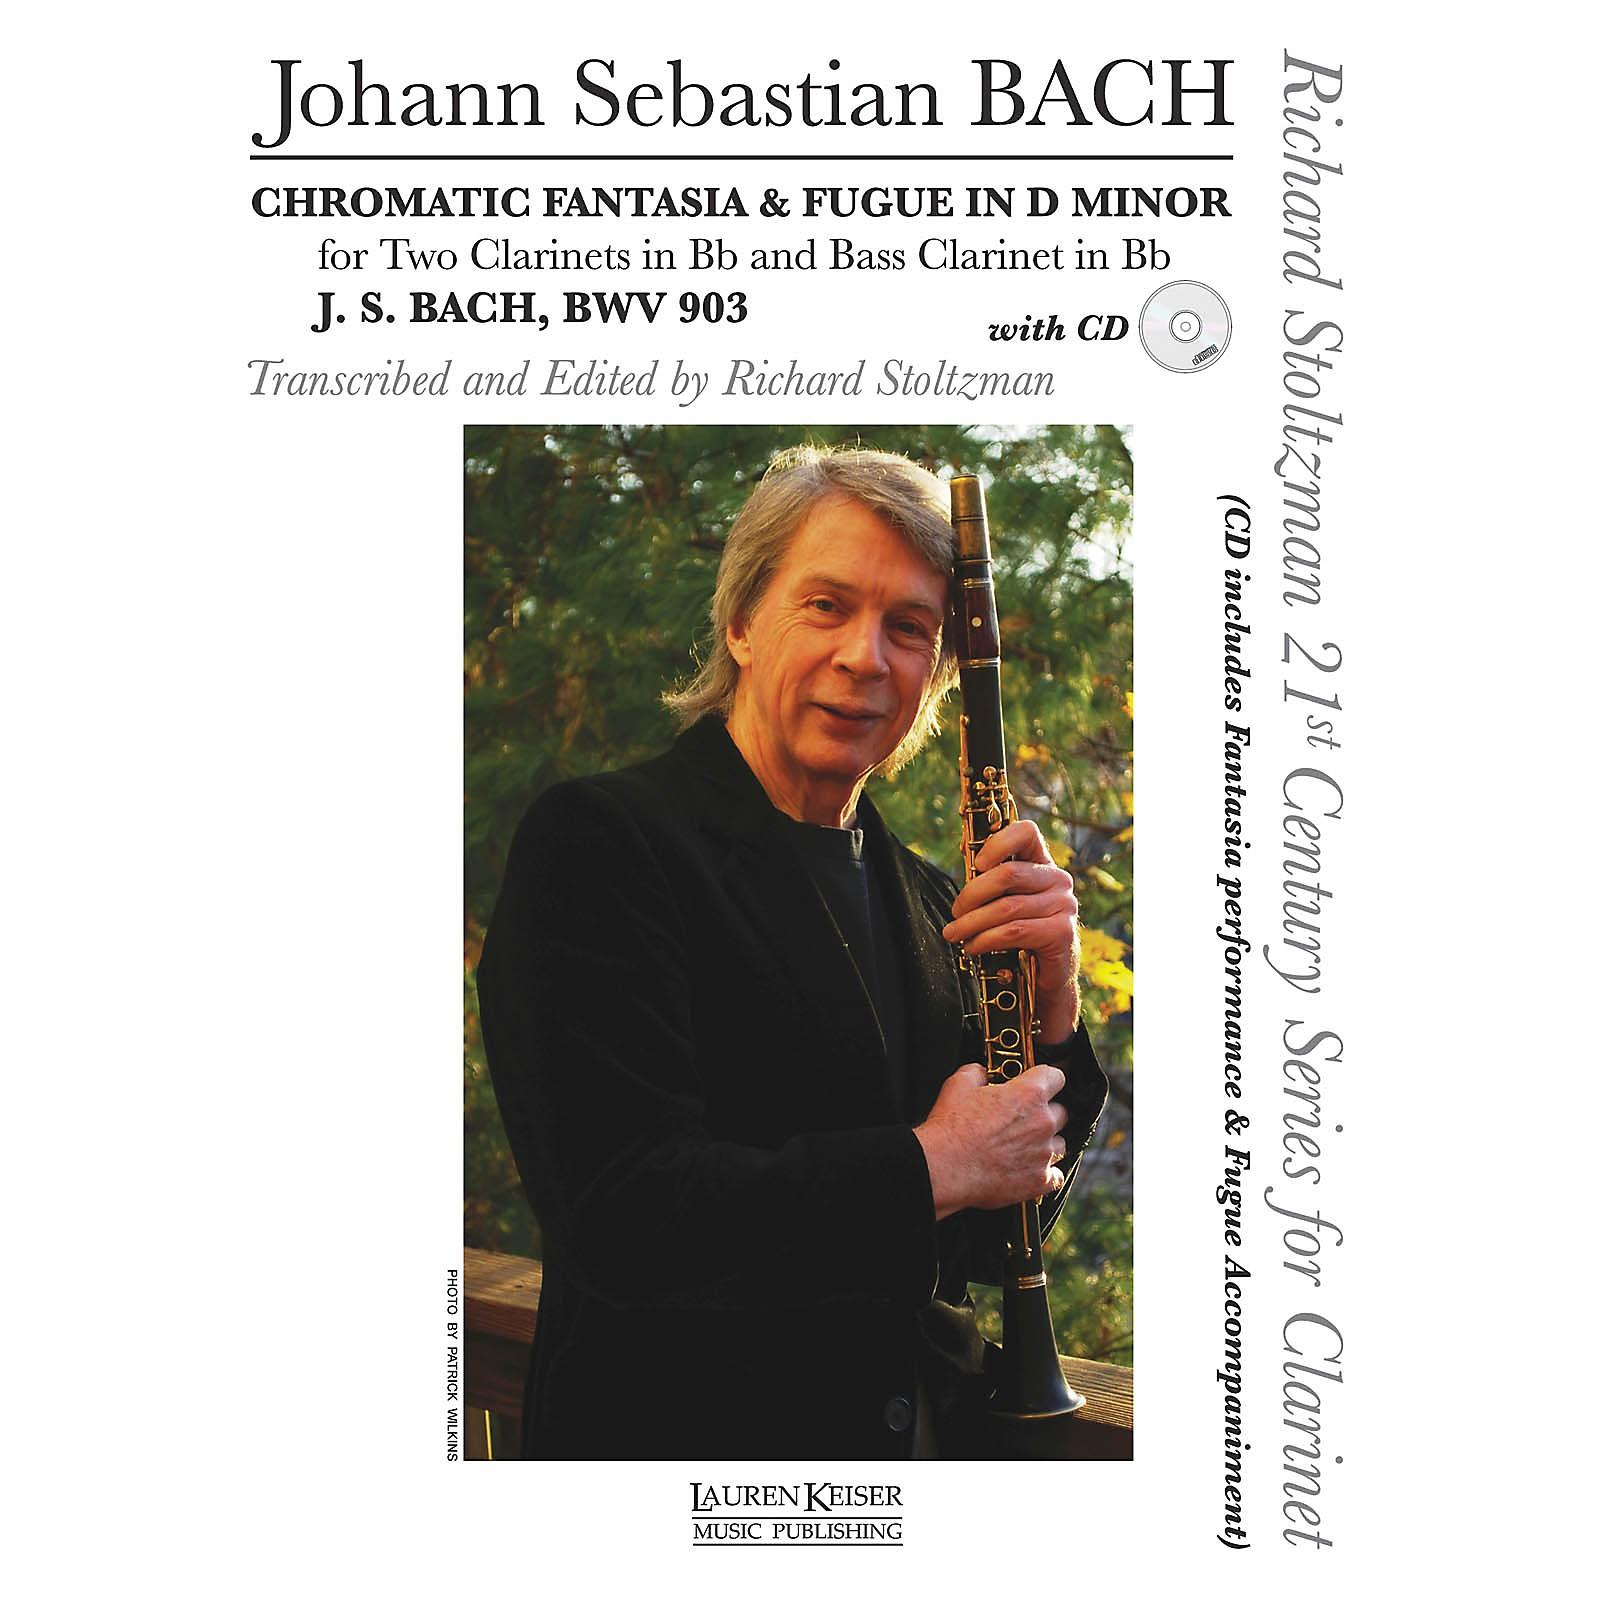 Lauren Keiser Music Publishing Chromatic Fantasia & Fugue in D minor, BWV 903 LKM Music Composed by Bach Arranged by Richard Stoltzman